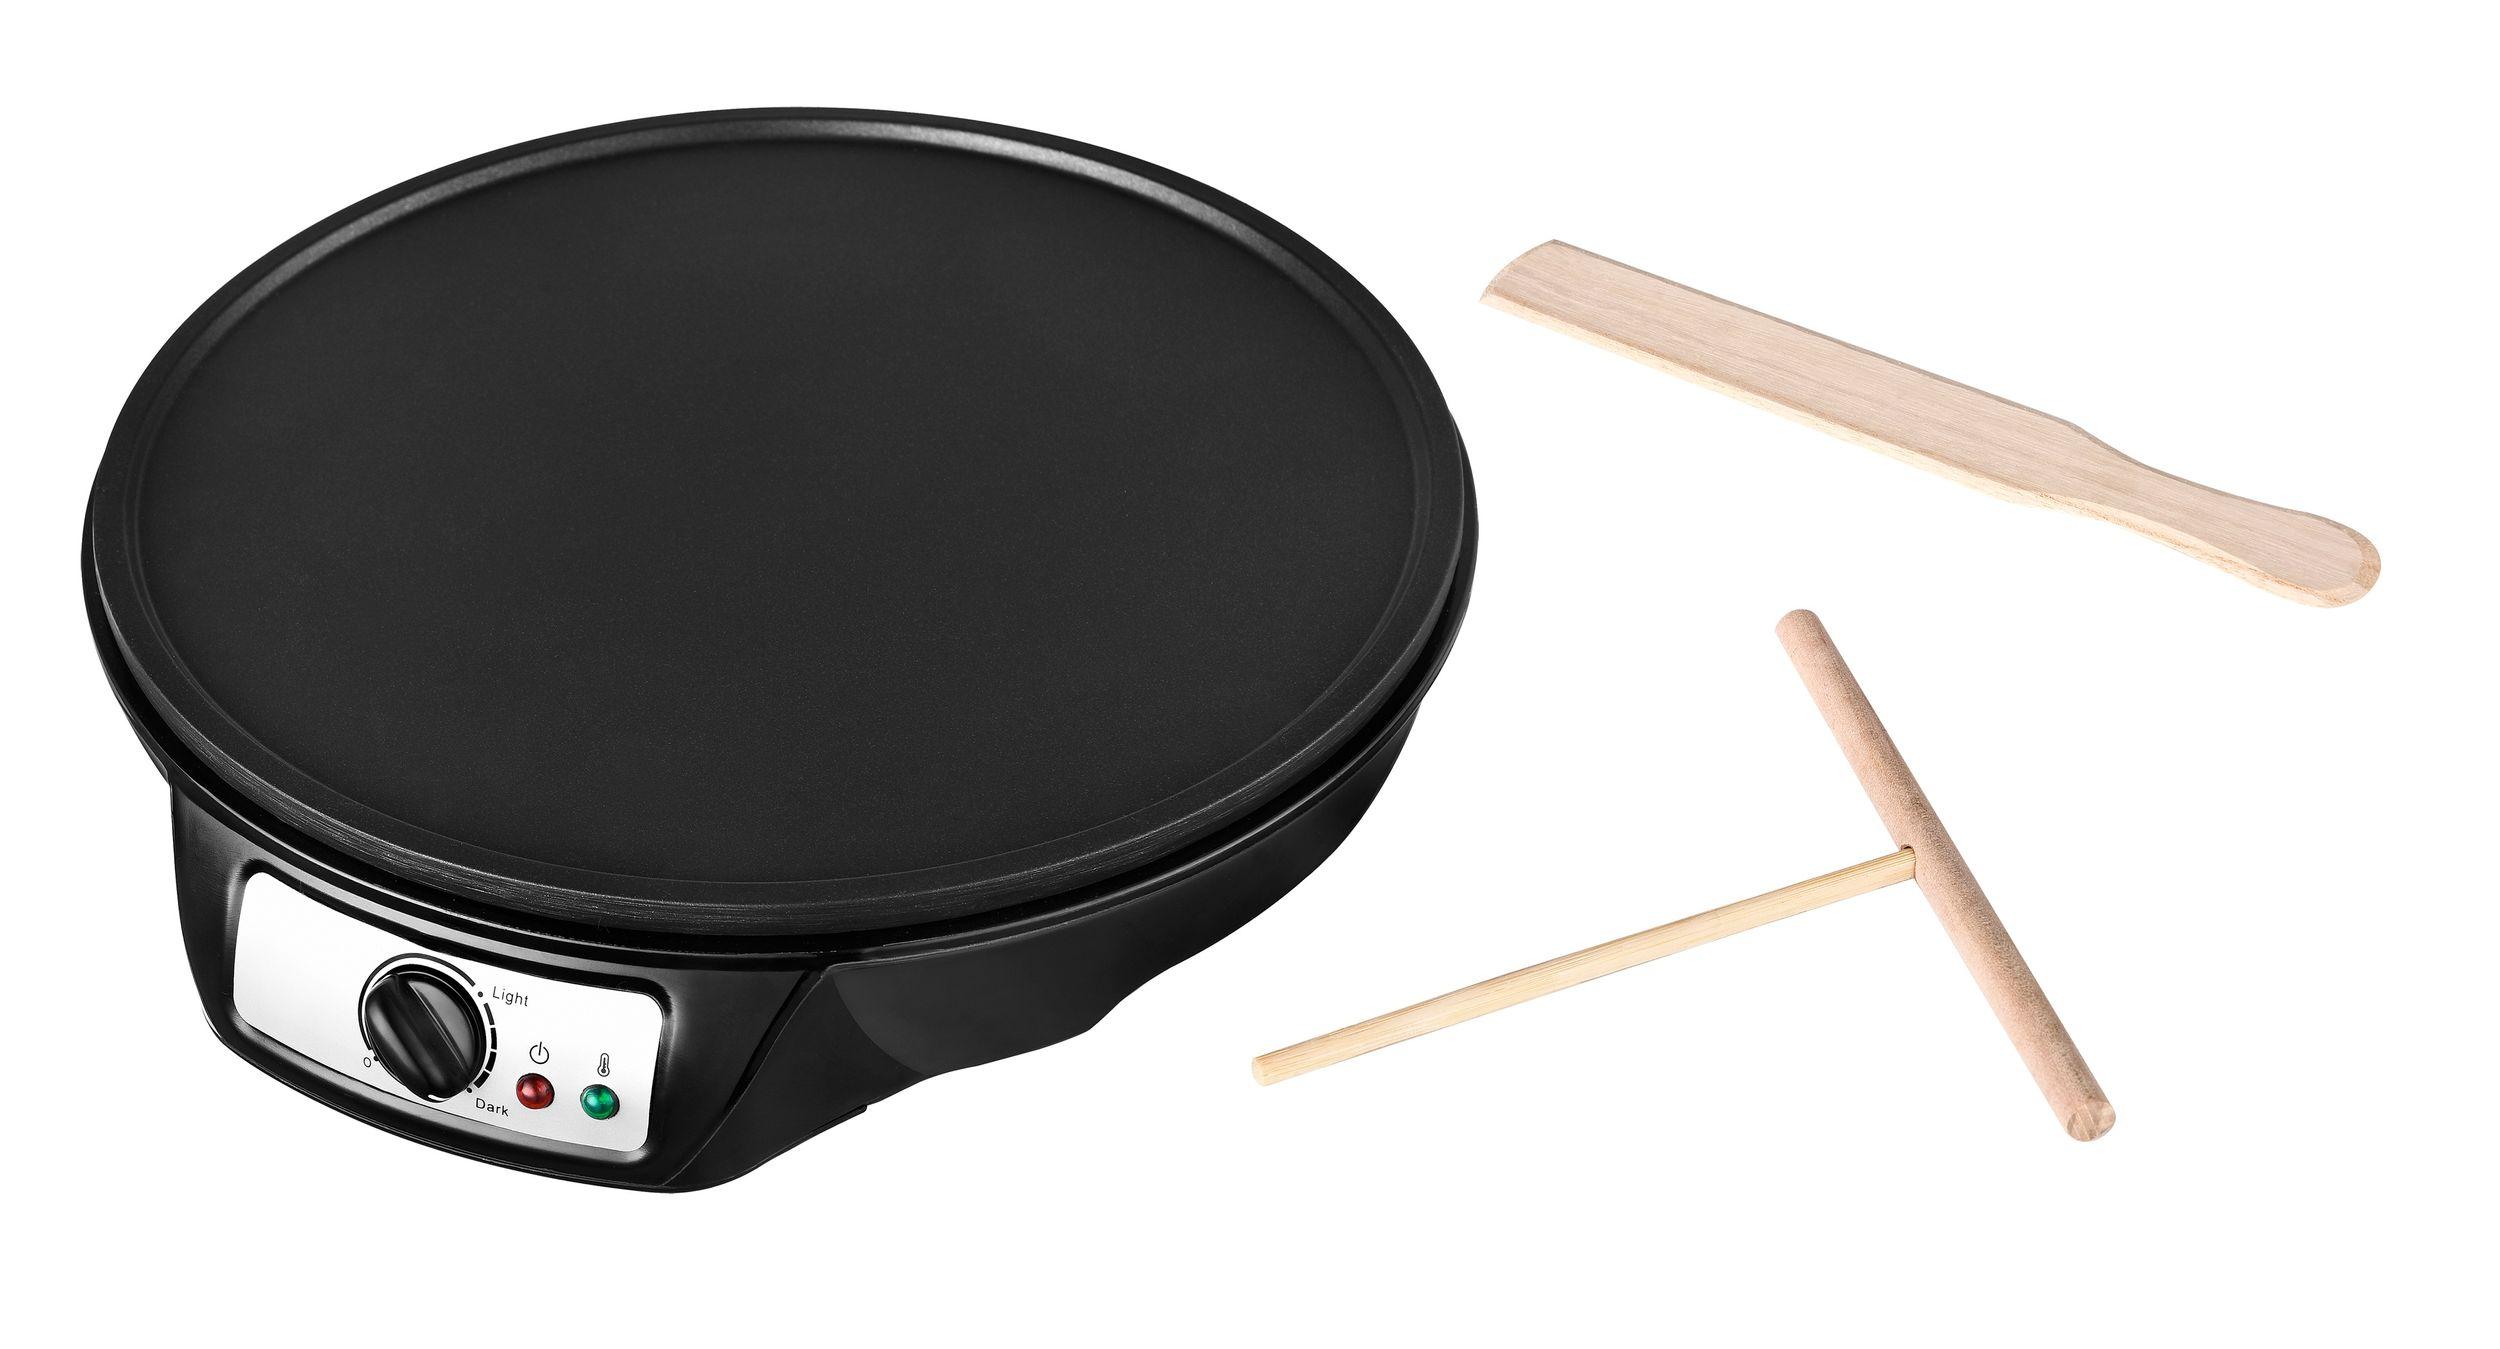 Crepes-Maker Crepeseisen Crepe Platte 30 cm Pfannkuchen Pfanne Wrap Omelette Waffeln*85102 Bild 2